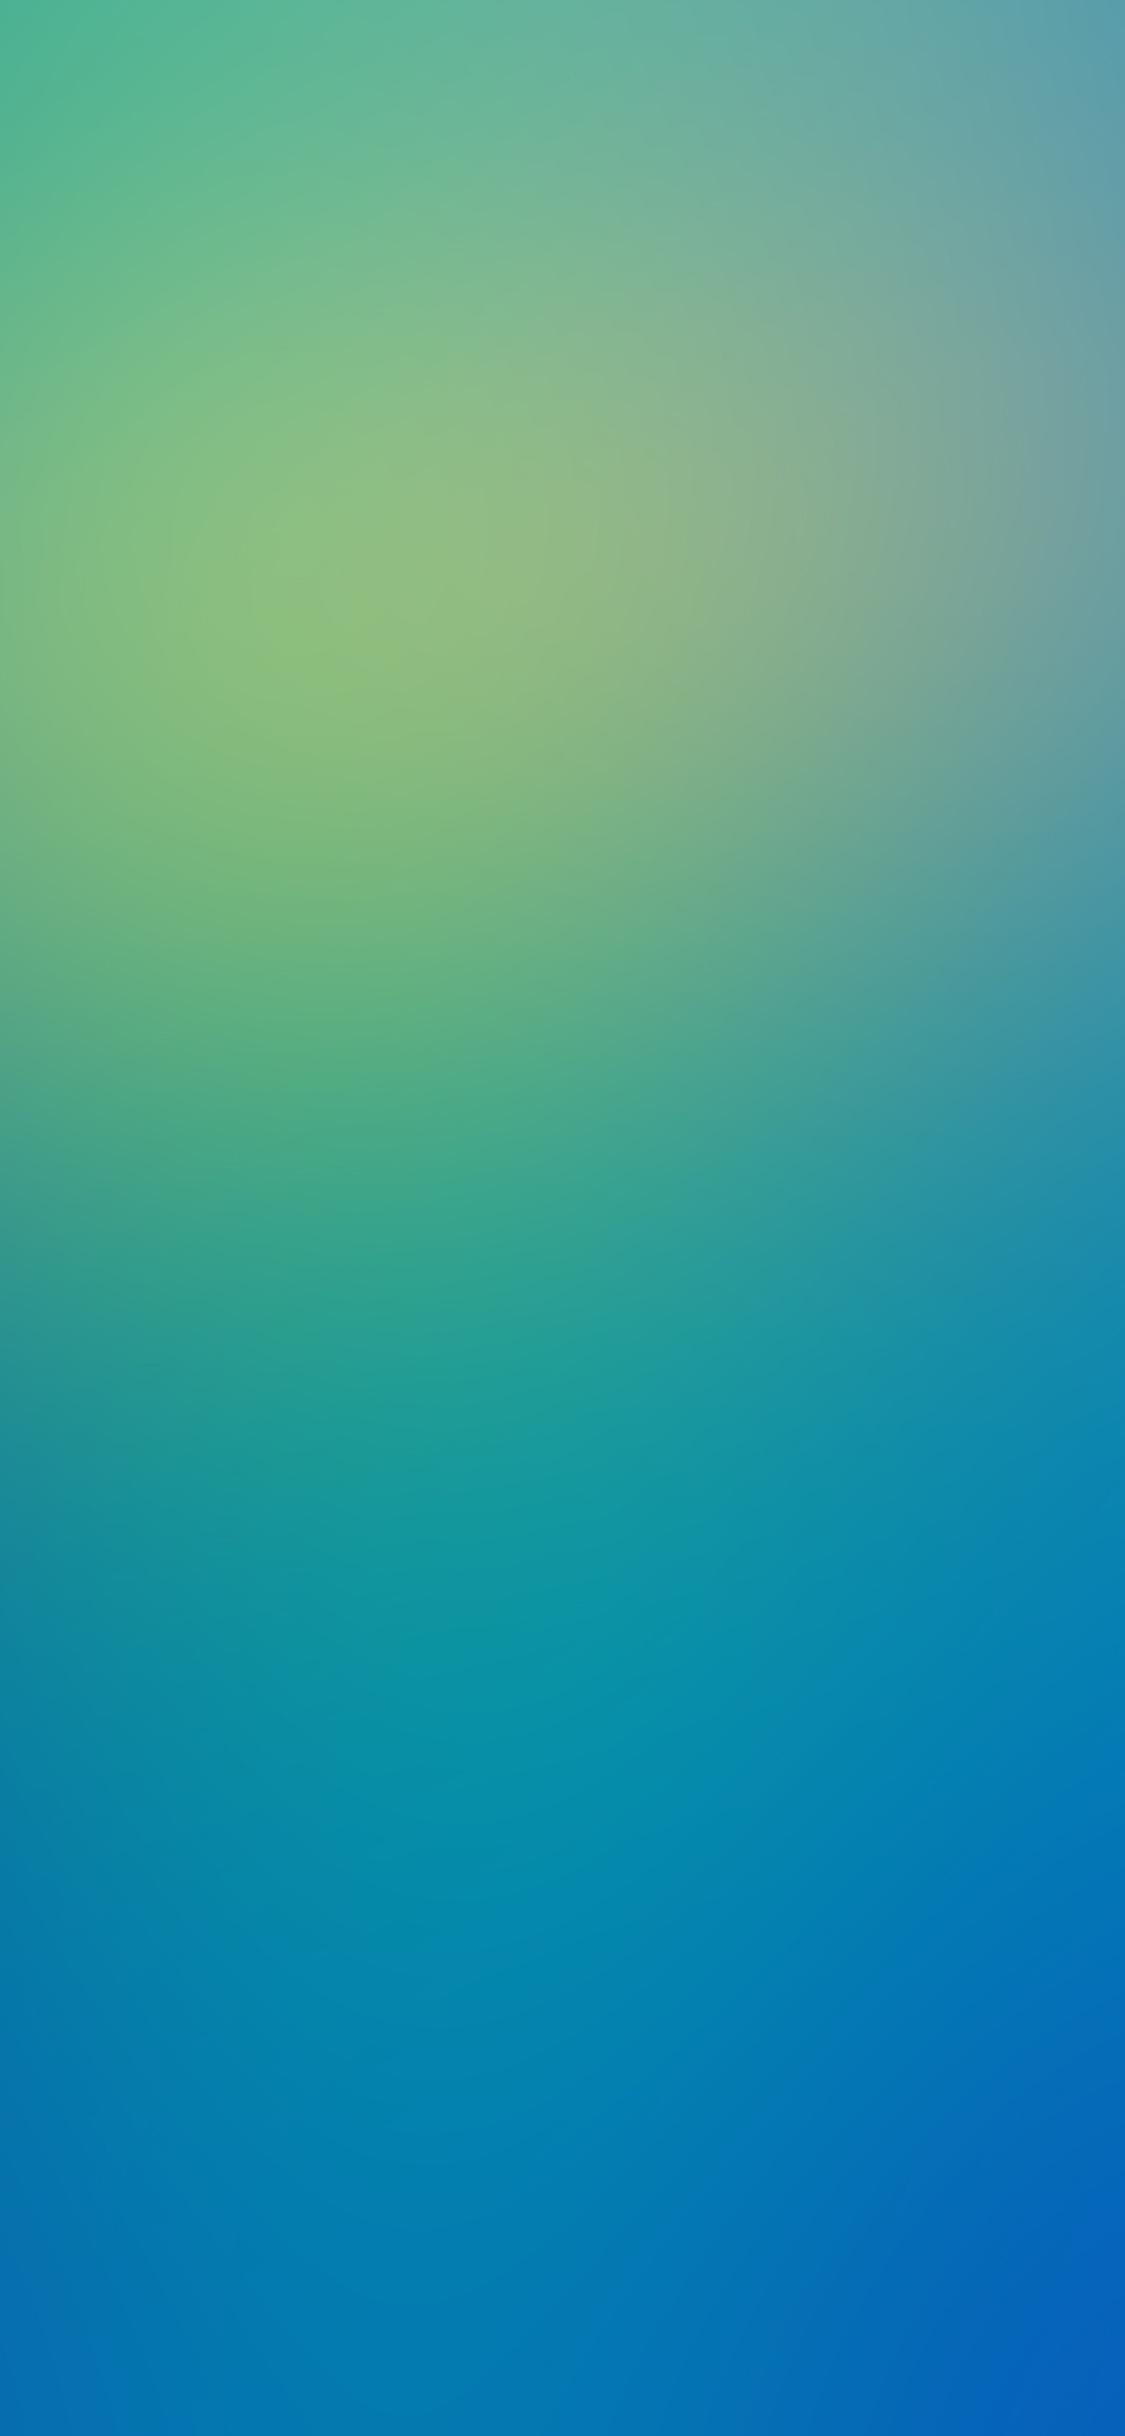 iPhoneXpapers.com-Apple-iPhone-wallpaper-si77-blue-green-light-focus-gradation-blur